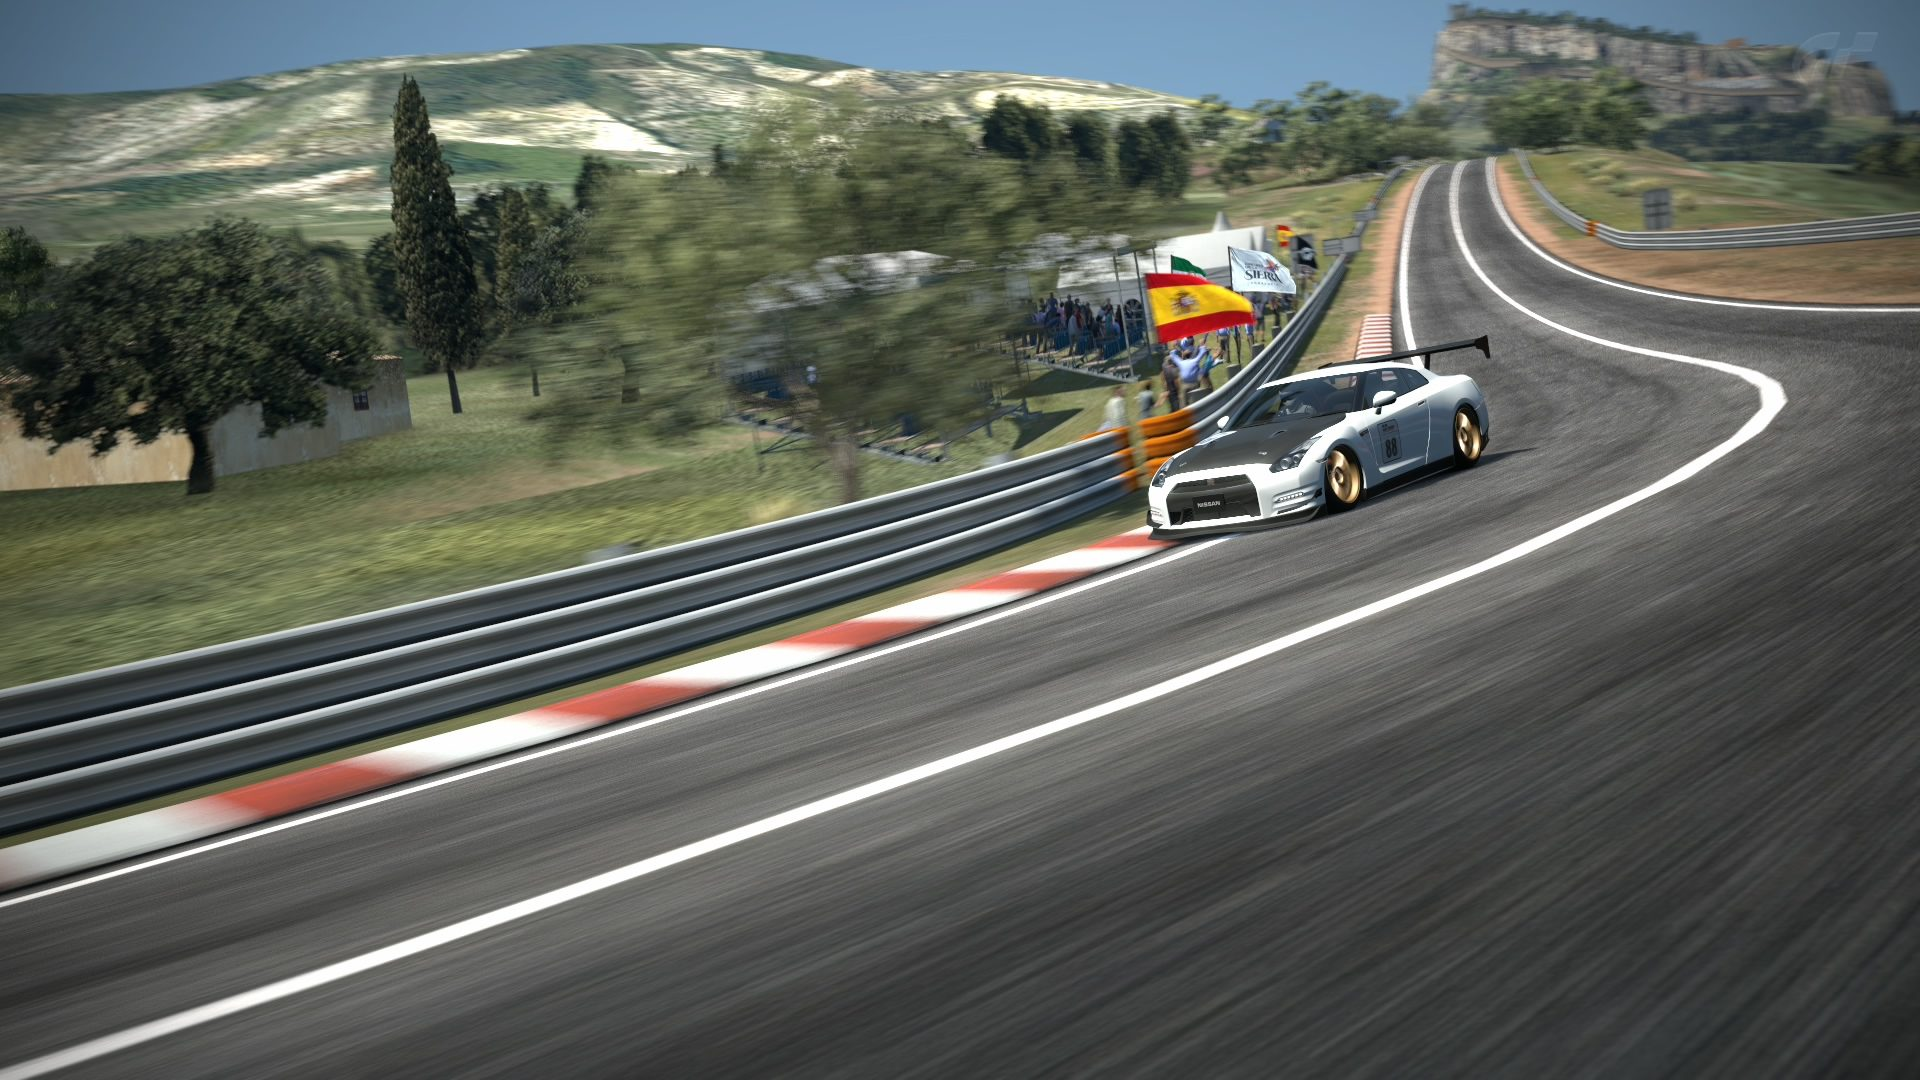 Circuito de la Sierra_3.jpg